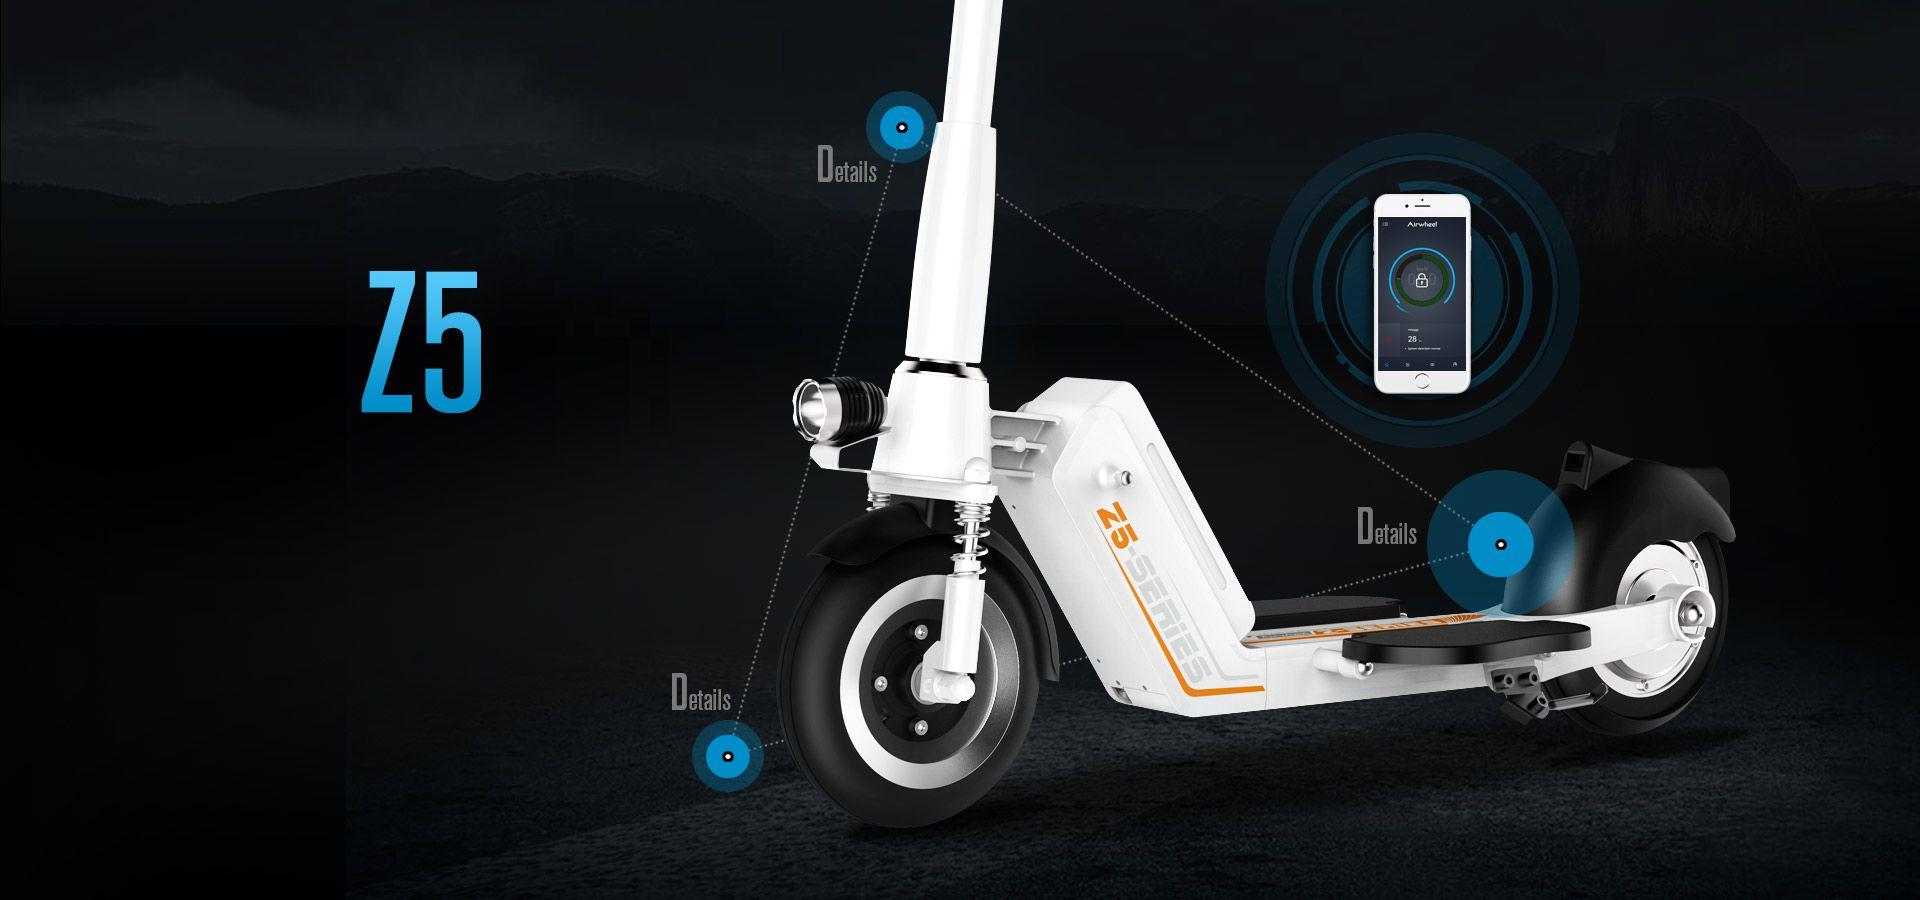 Z5 2 ruote scooter elettrico